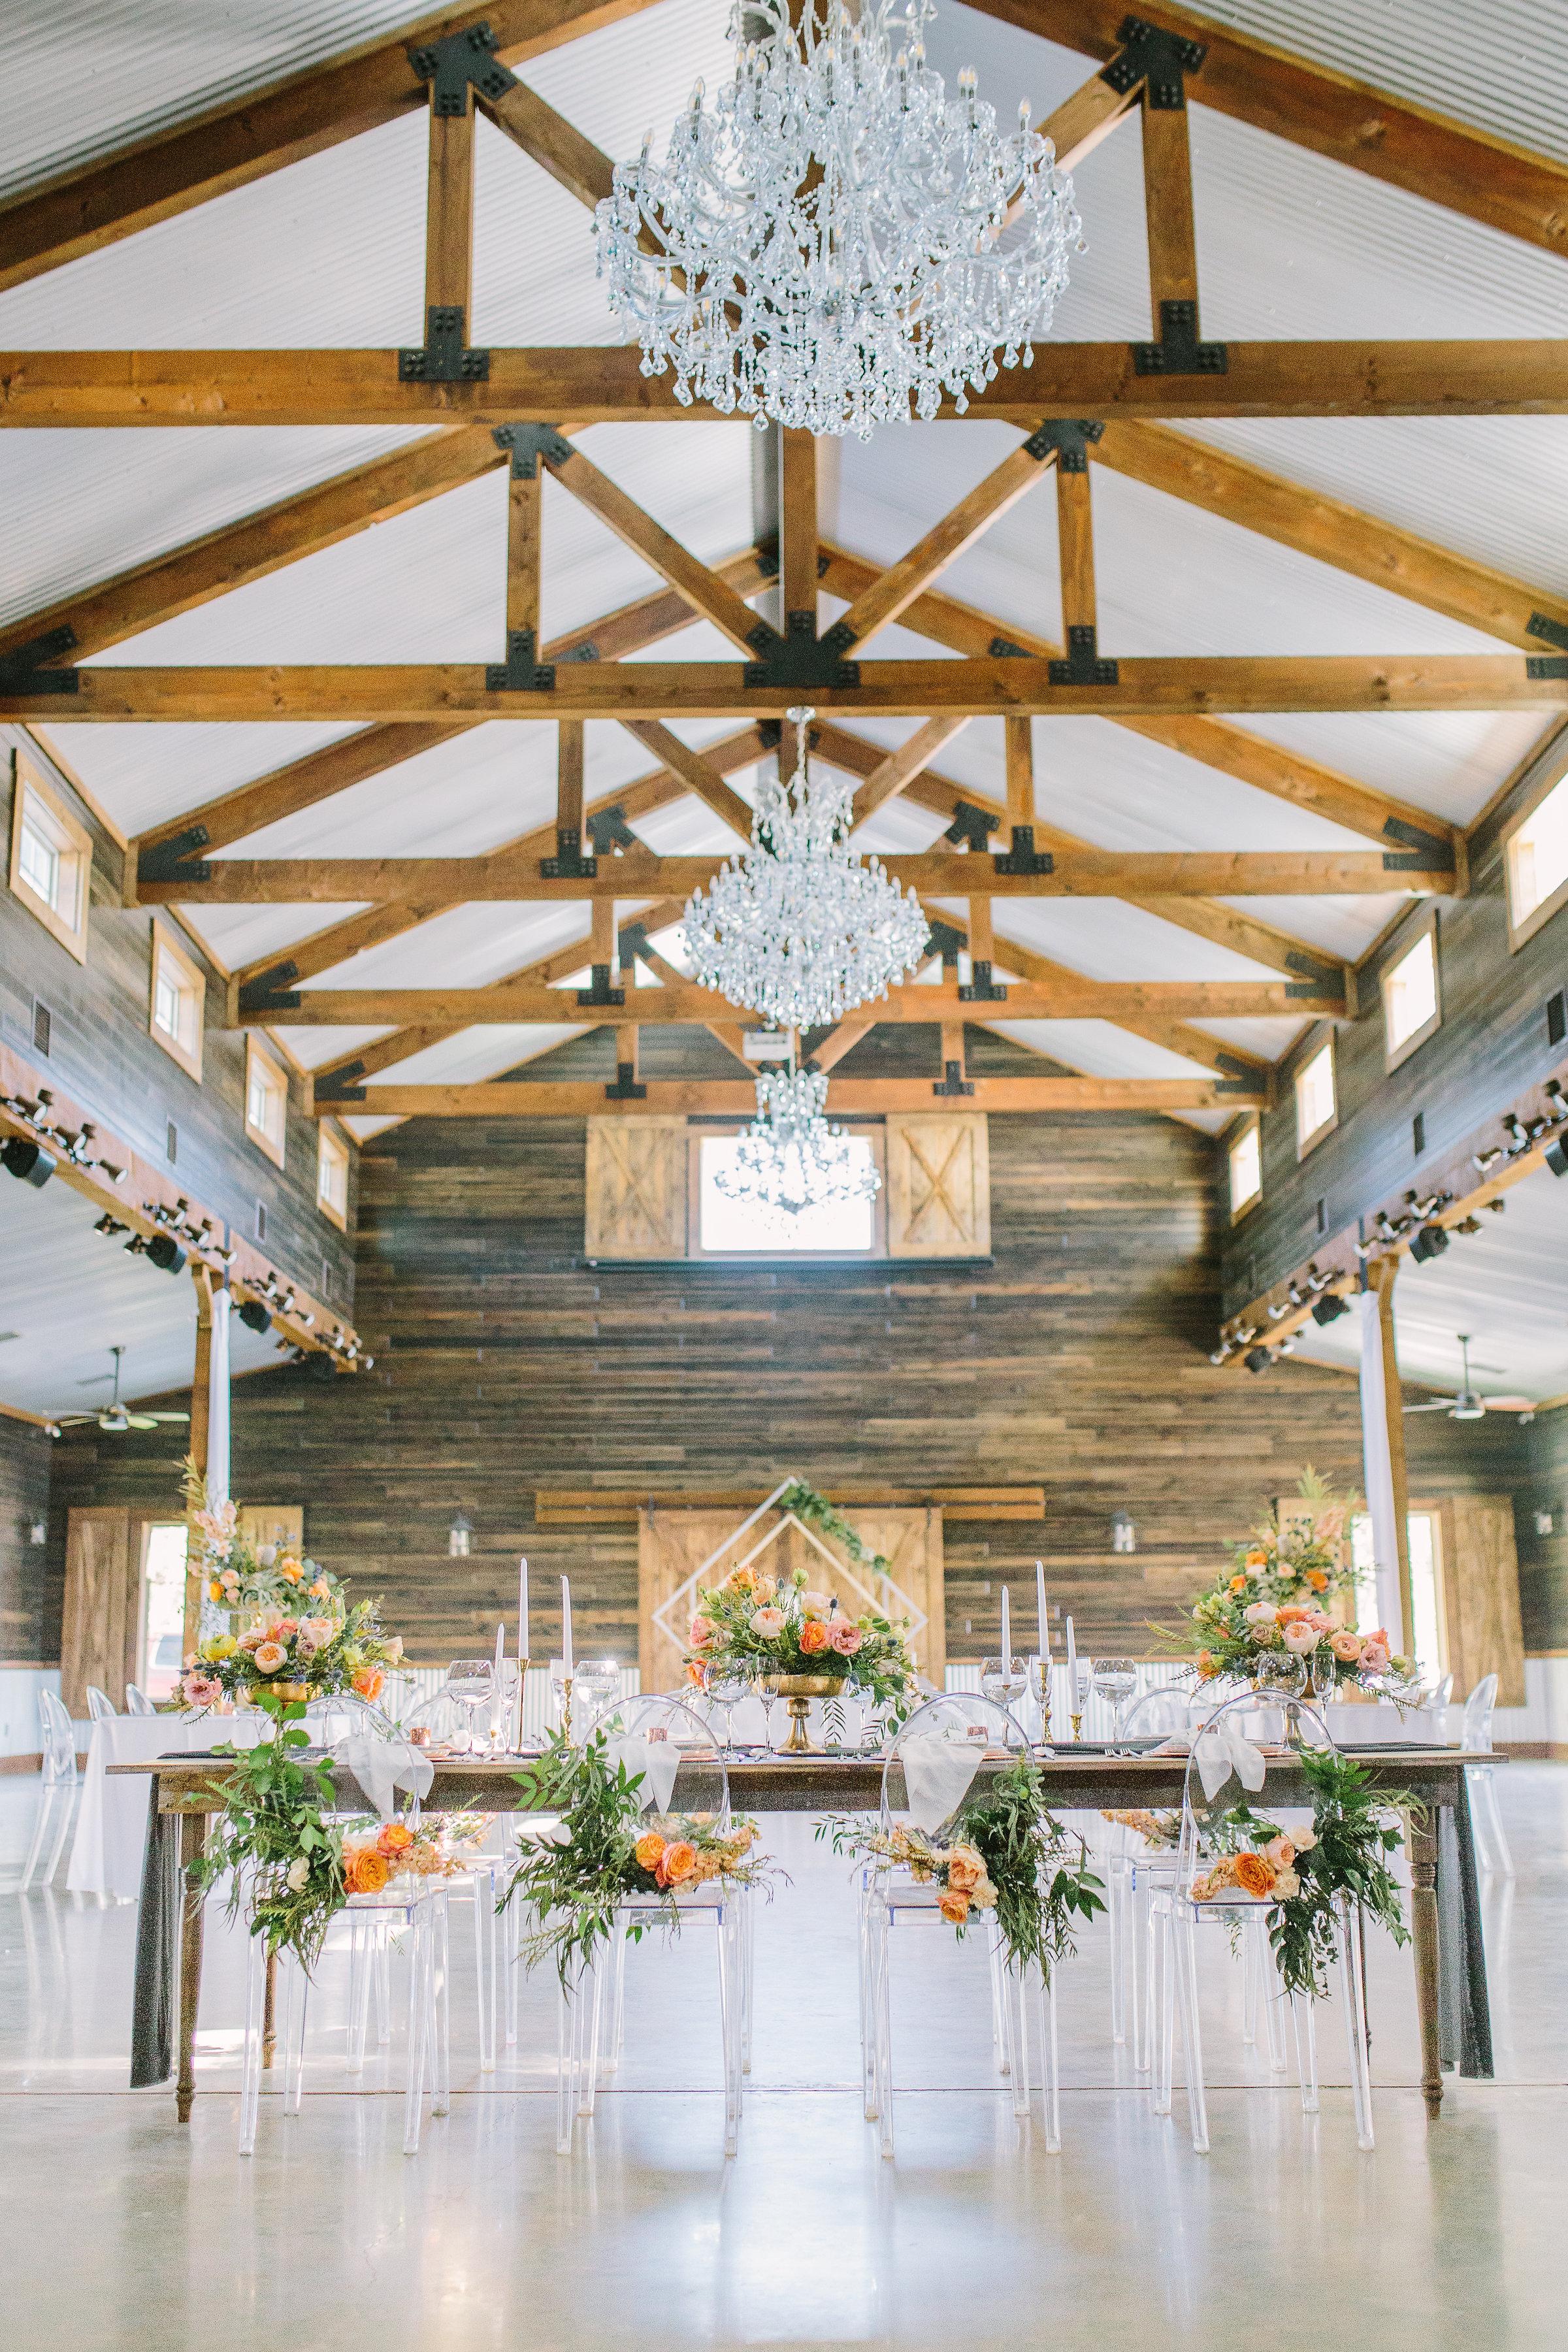 Ellen-Ashton-Photography-Peach-Creek-Ranch-Weddings-Wed-and-Prosper128